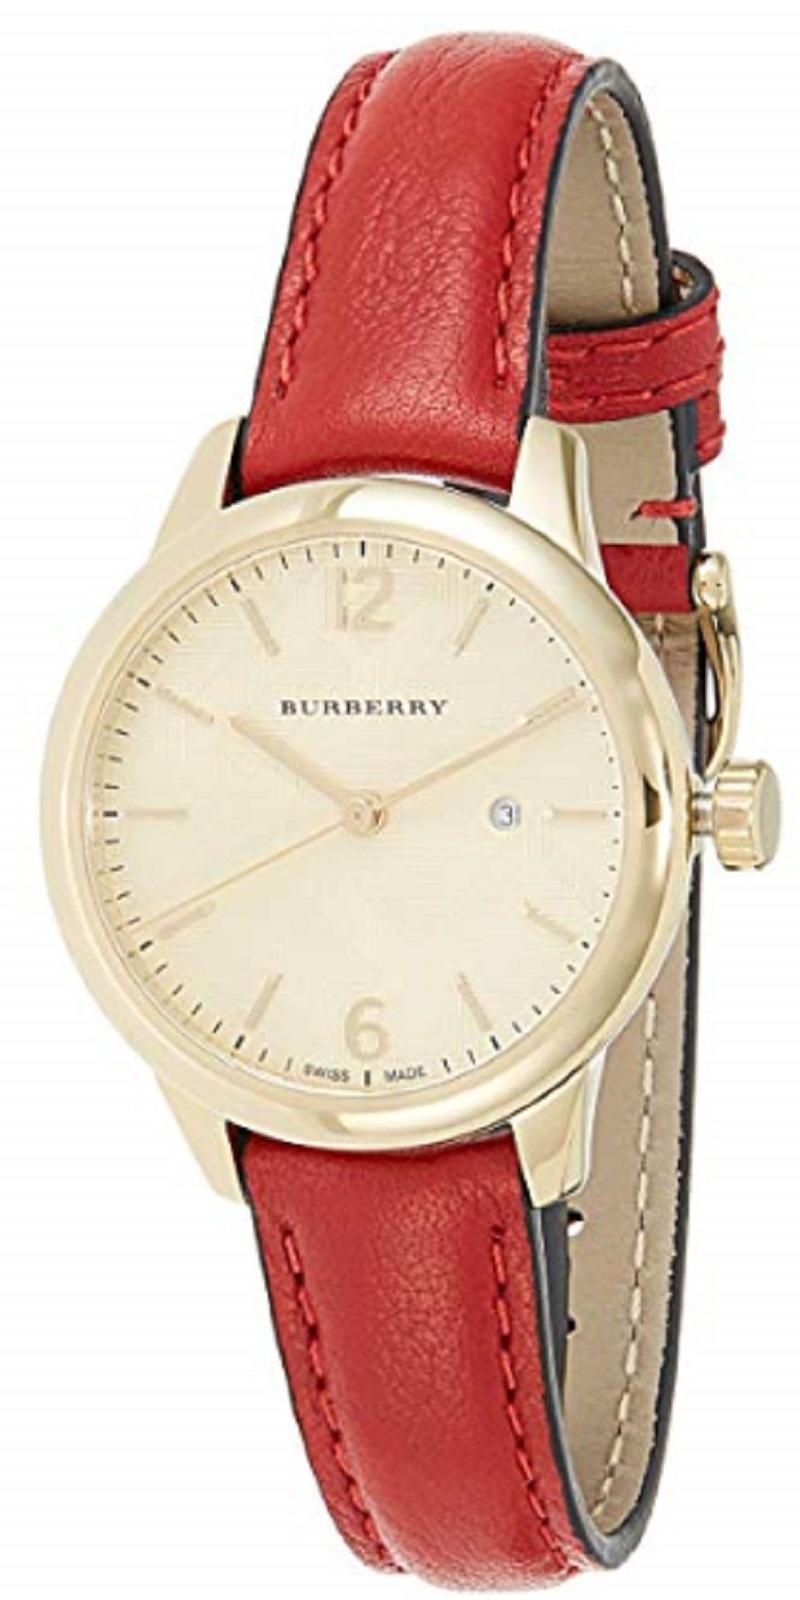 NWT *AUTHENTIC* Burberry BU10102 Women's Swiss Red Leather Strap Watch